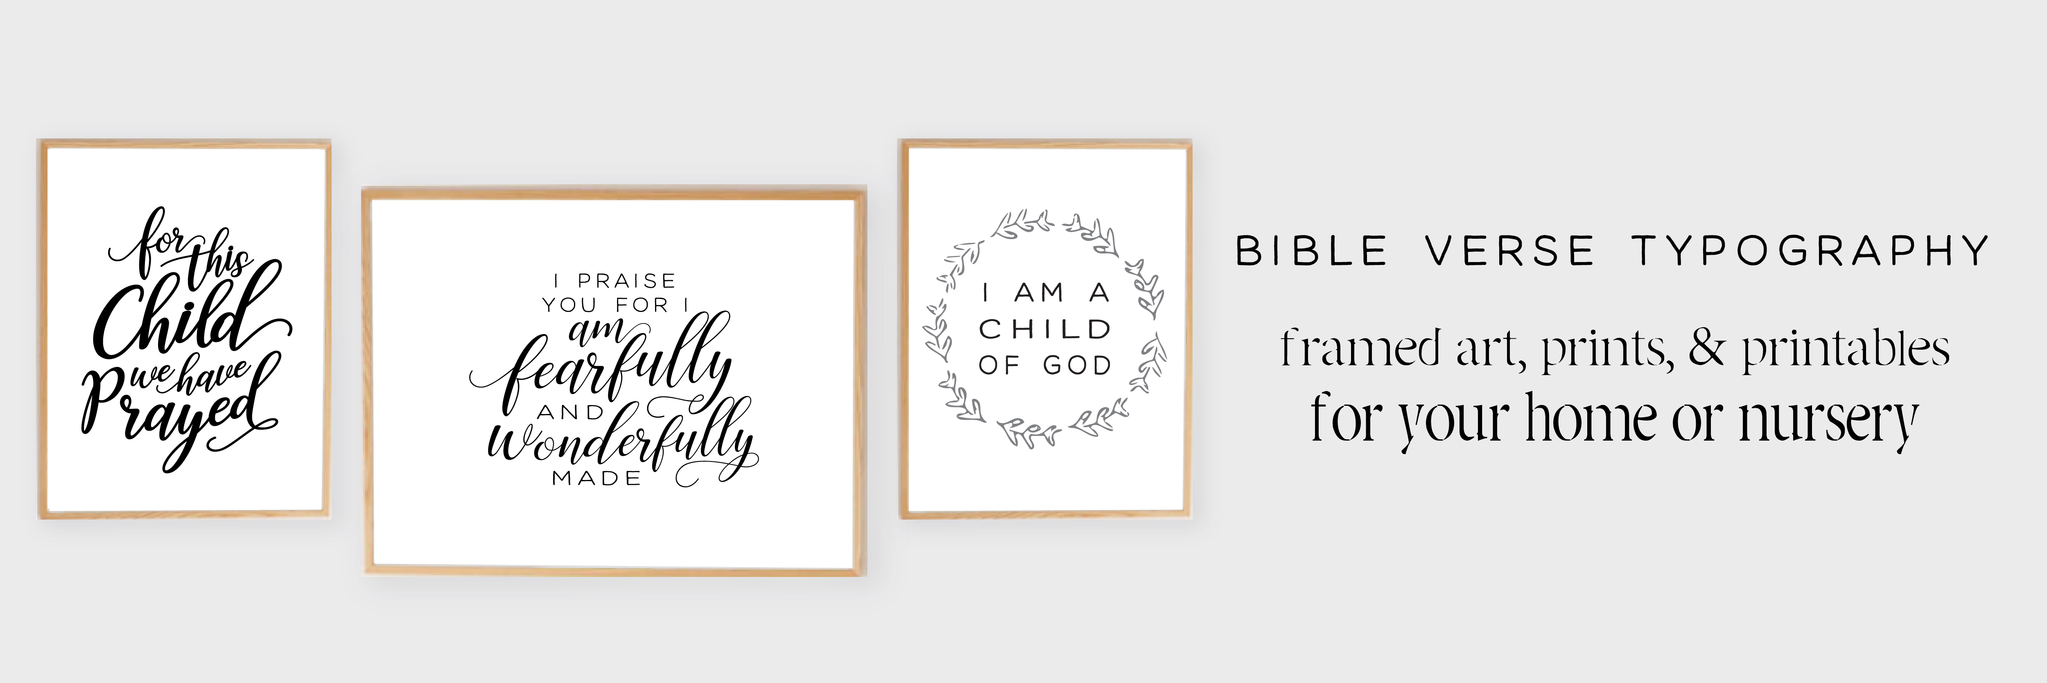 bible_verse_typography_nursery_art-01_375a63e0-0f33-4a11-a6a6-26dc5150eb0b_2048x2048 (1)